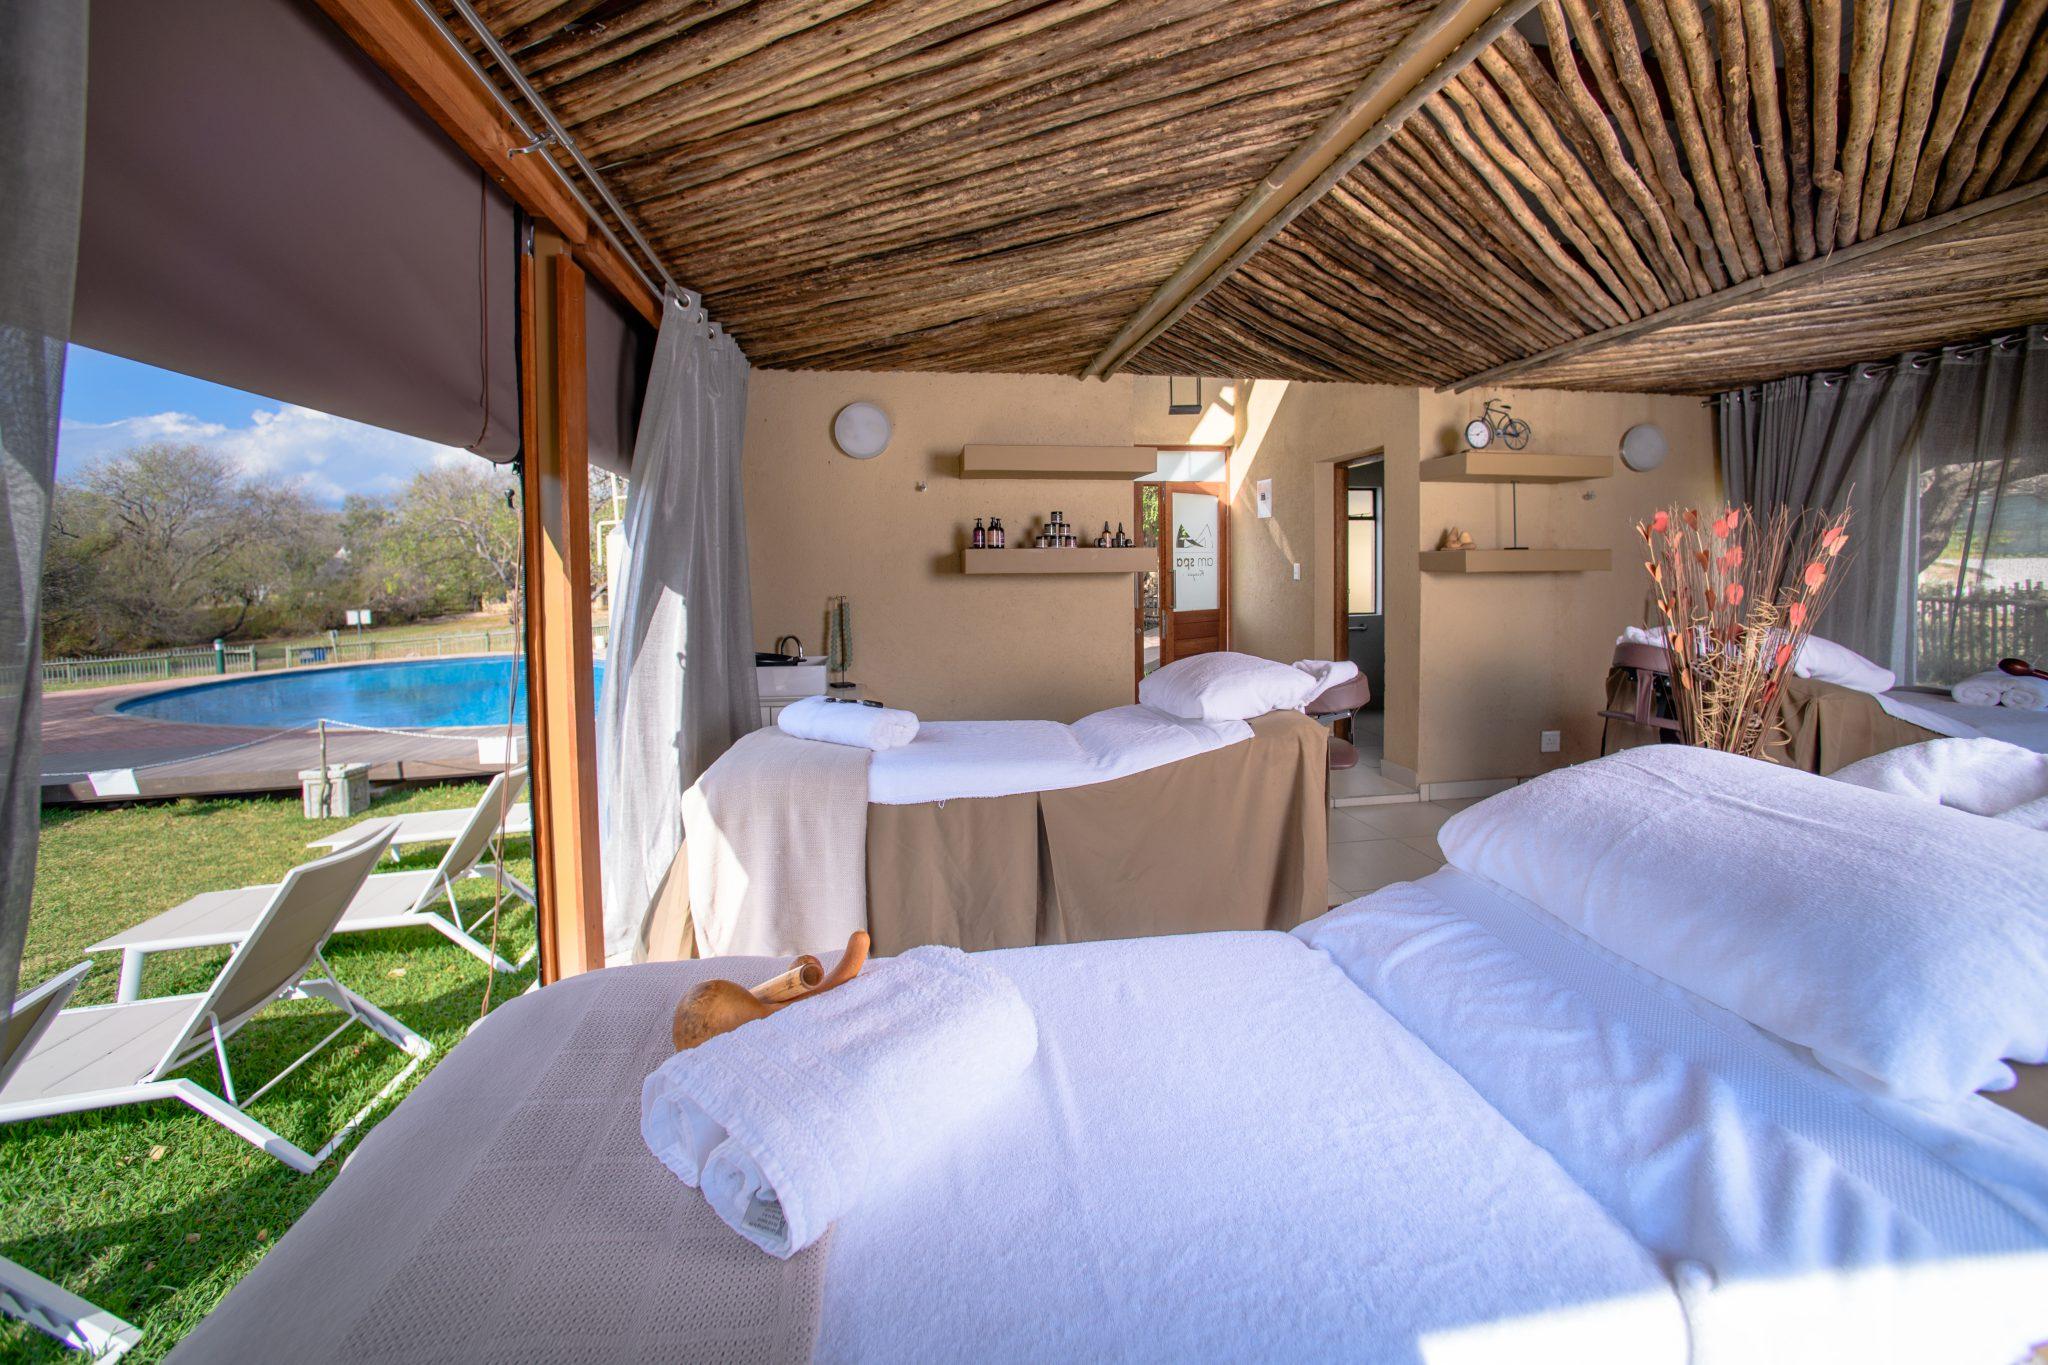 Outdoor massage beds